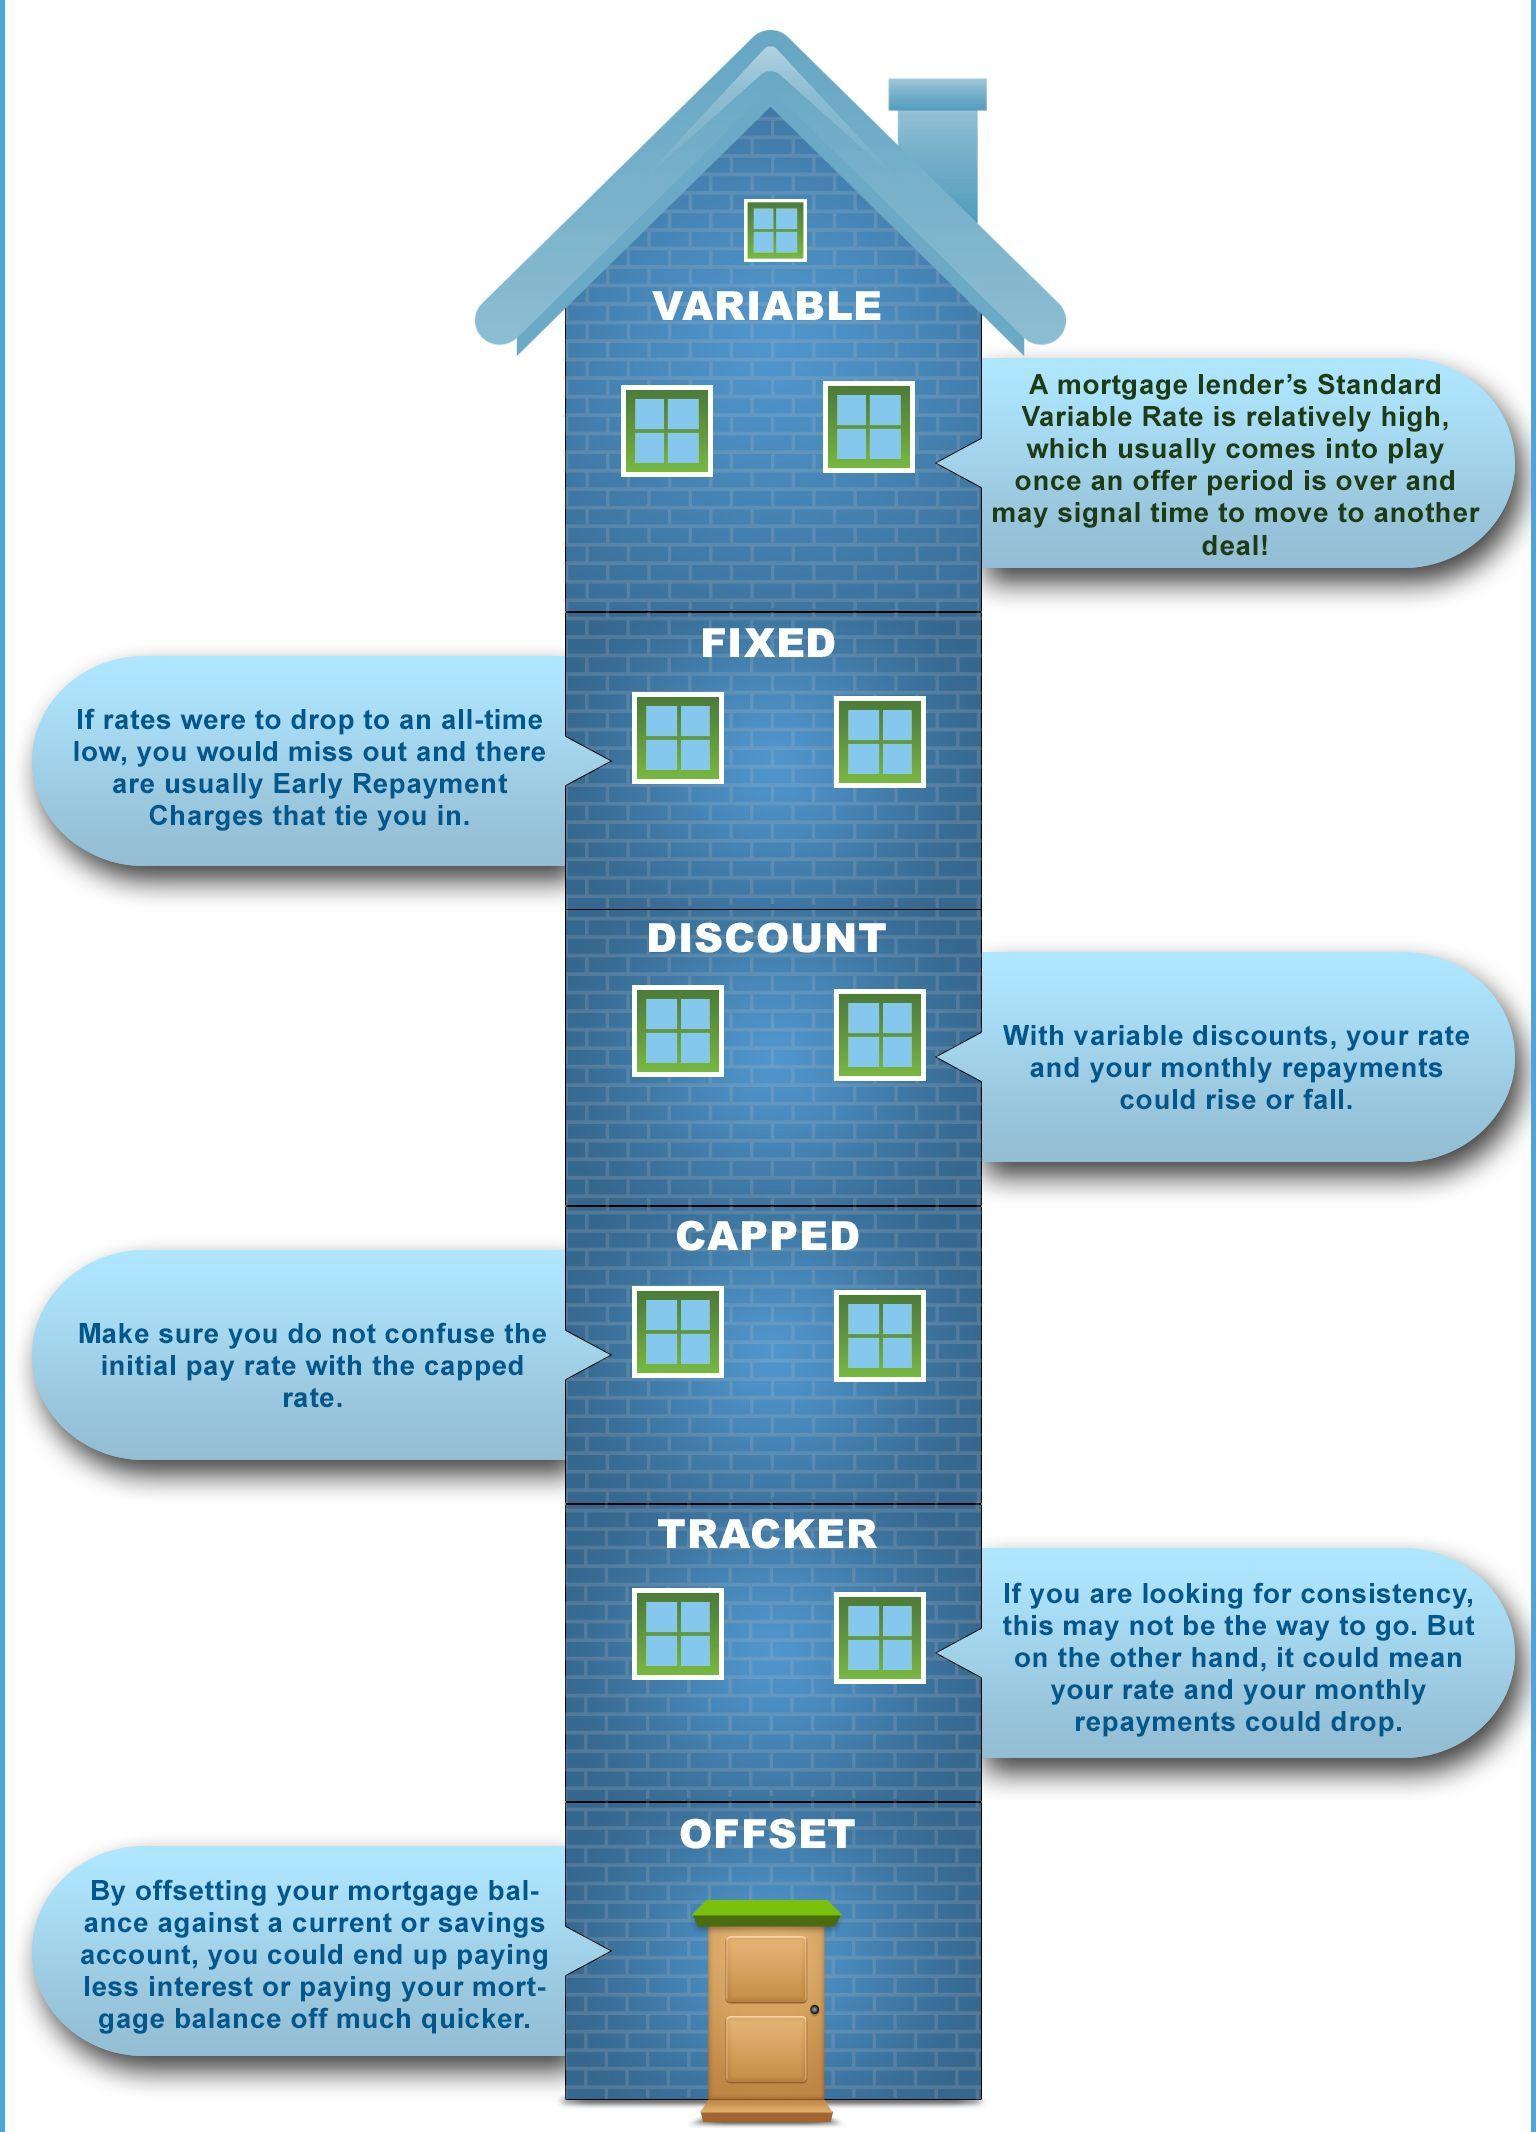 idbi bank home loan offers flexible loan repayment options and